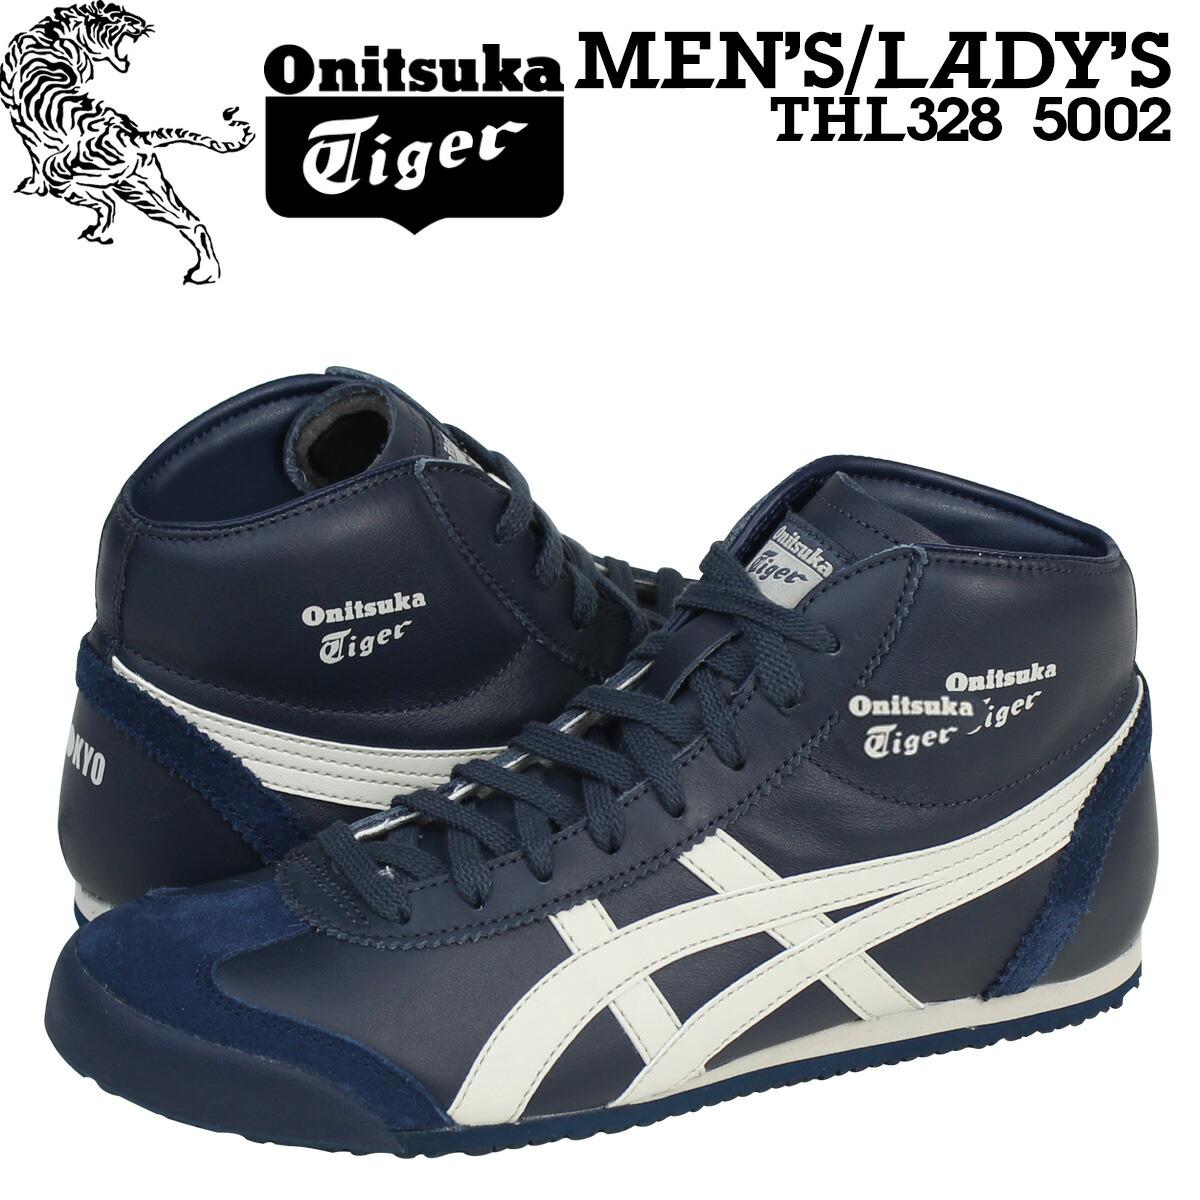 Buy onitsuka tiger high tops mens \u003e Up